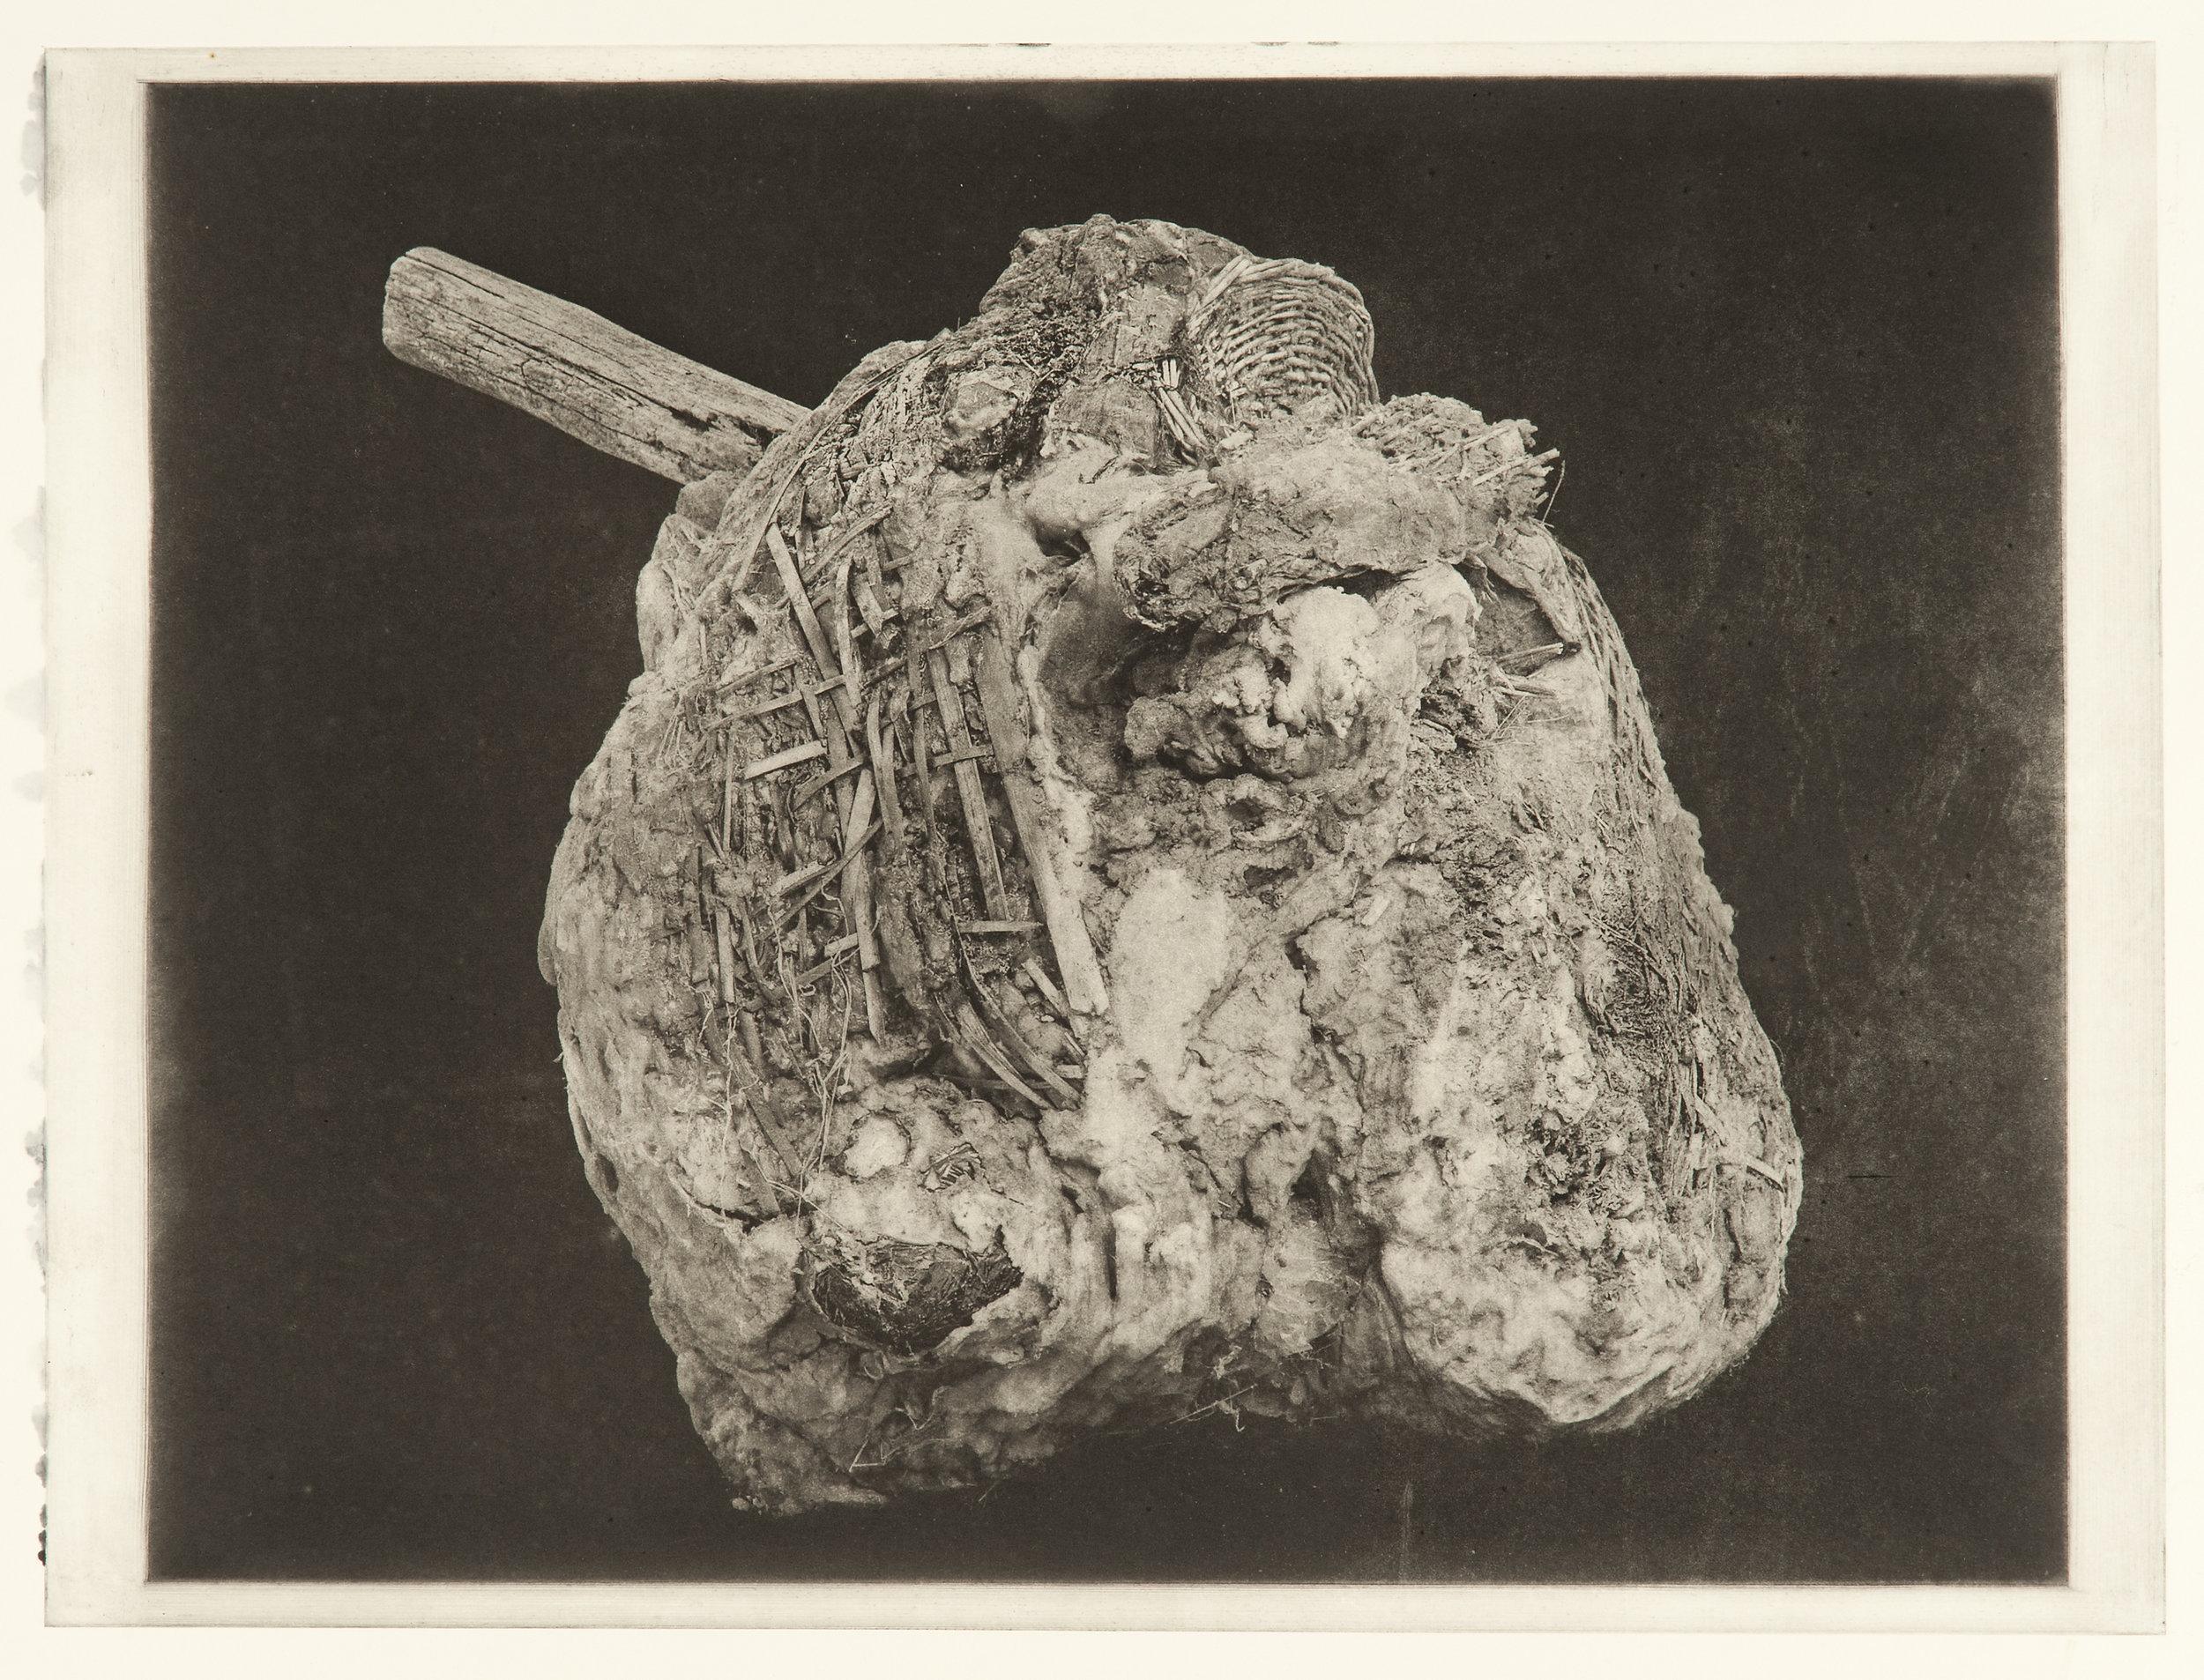 """Degeneration # 4456"", 22"" x 30"", photogravure of urethane sculpture weathered"